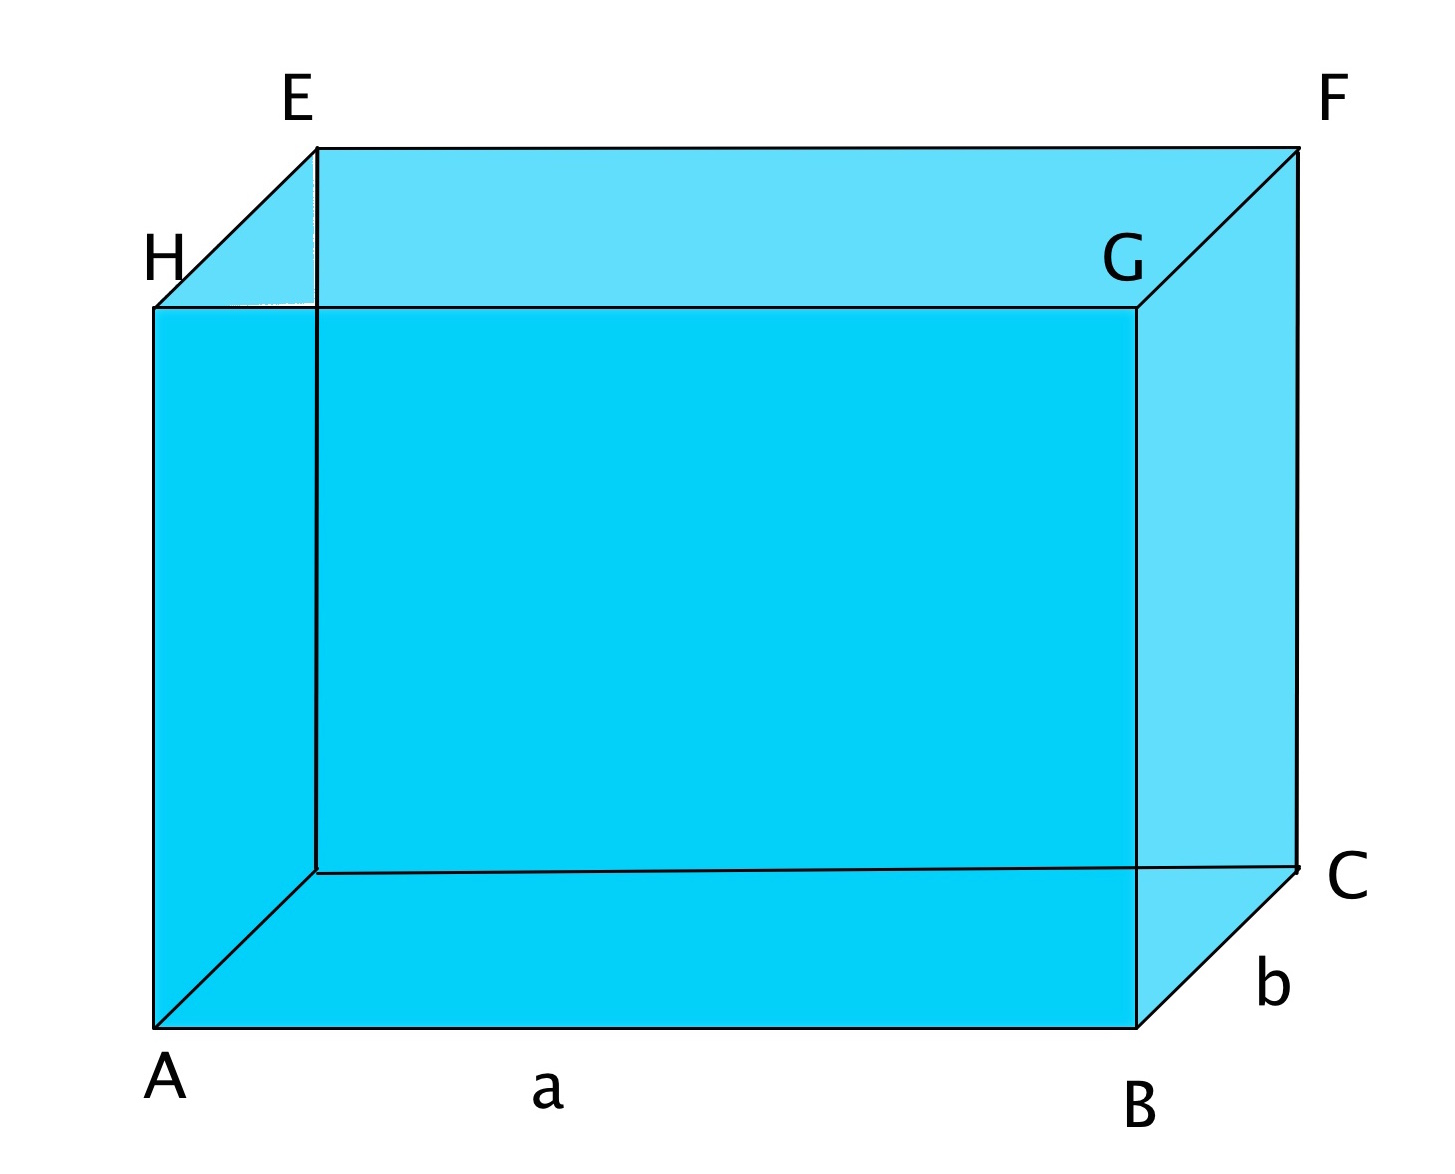 Quader Volumen